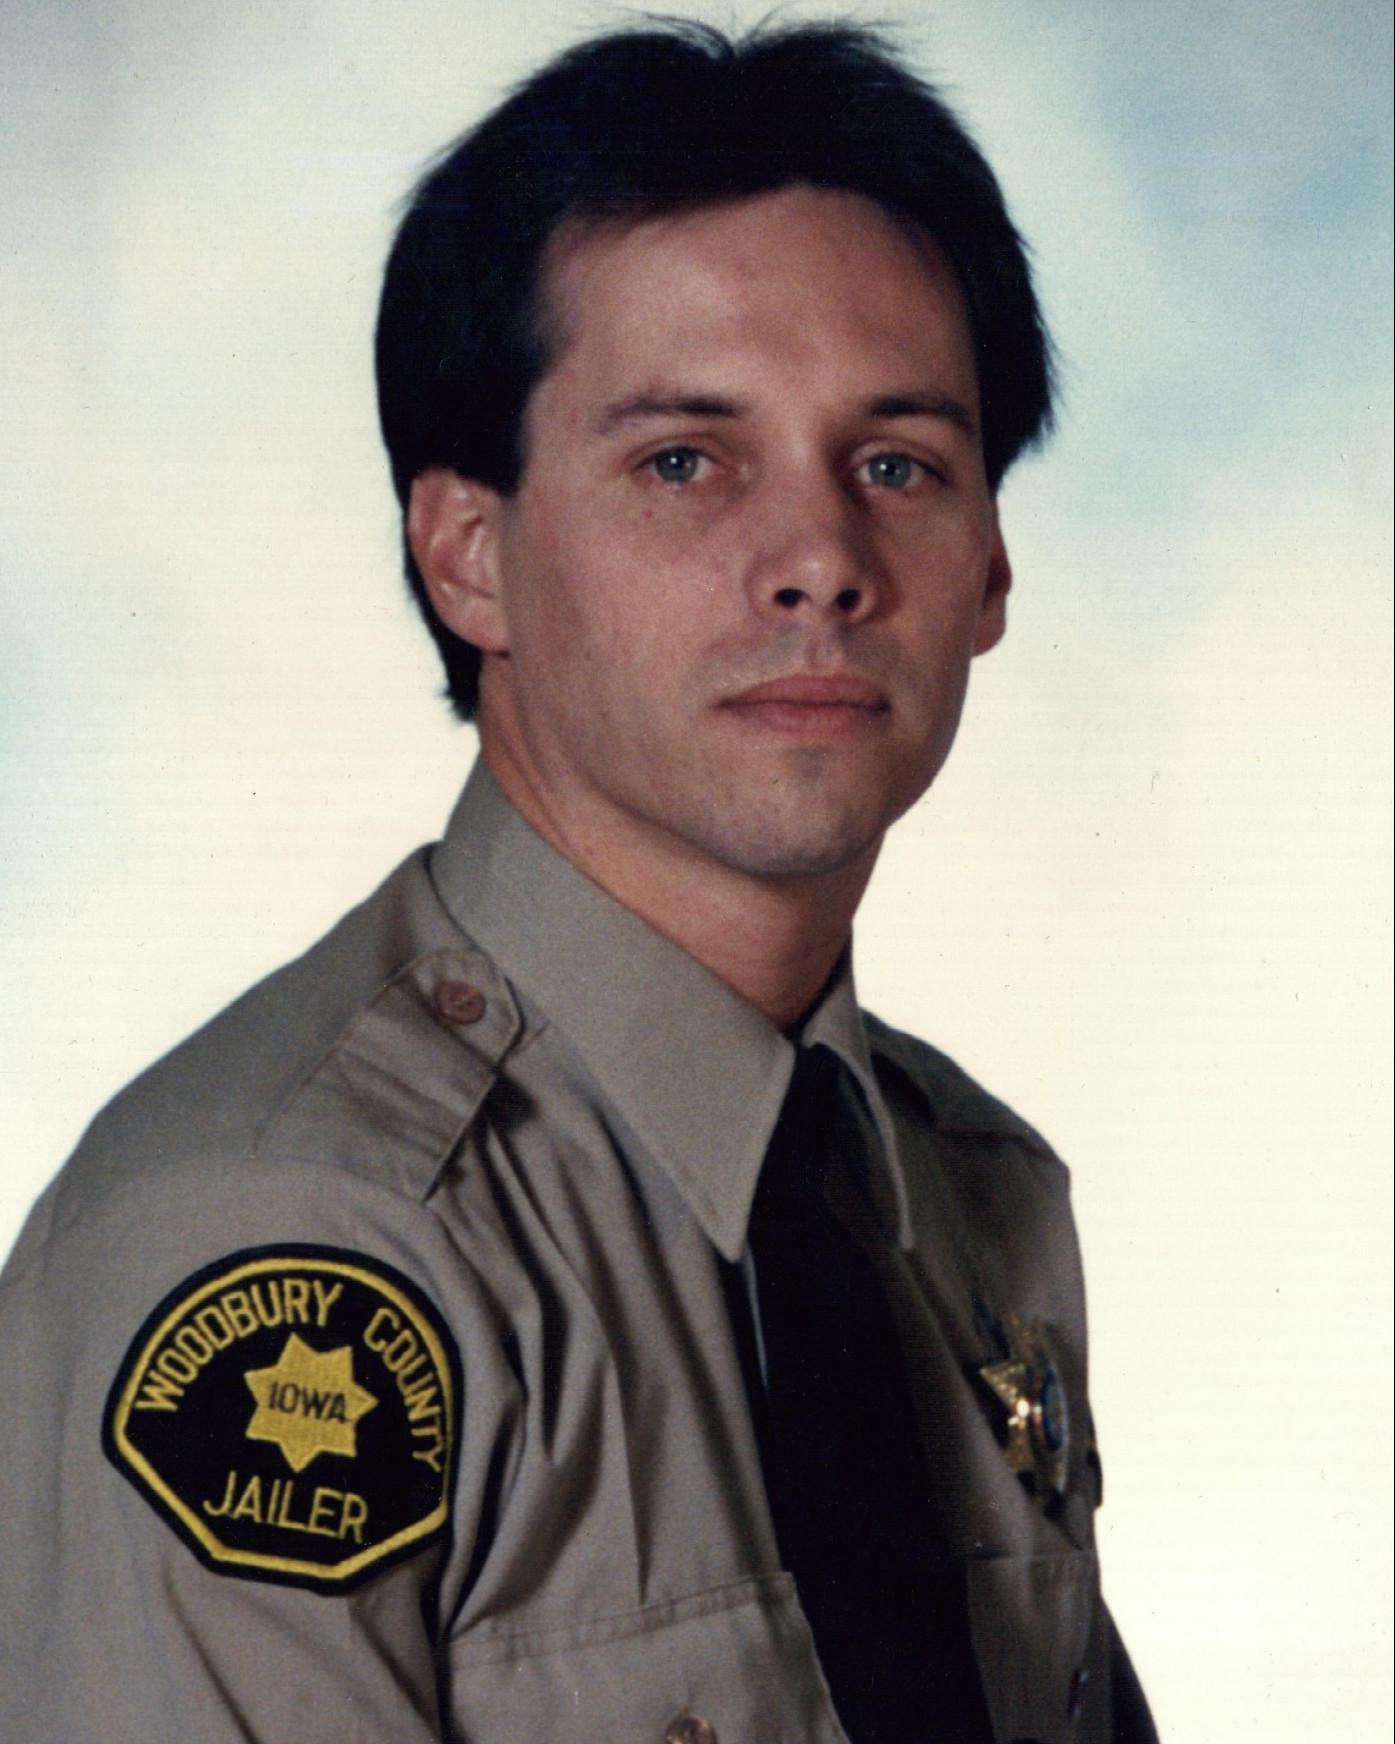 Corporal Jon Eric Hermann   Woodbury County Sheriff's Office, Iowa